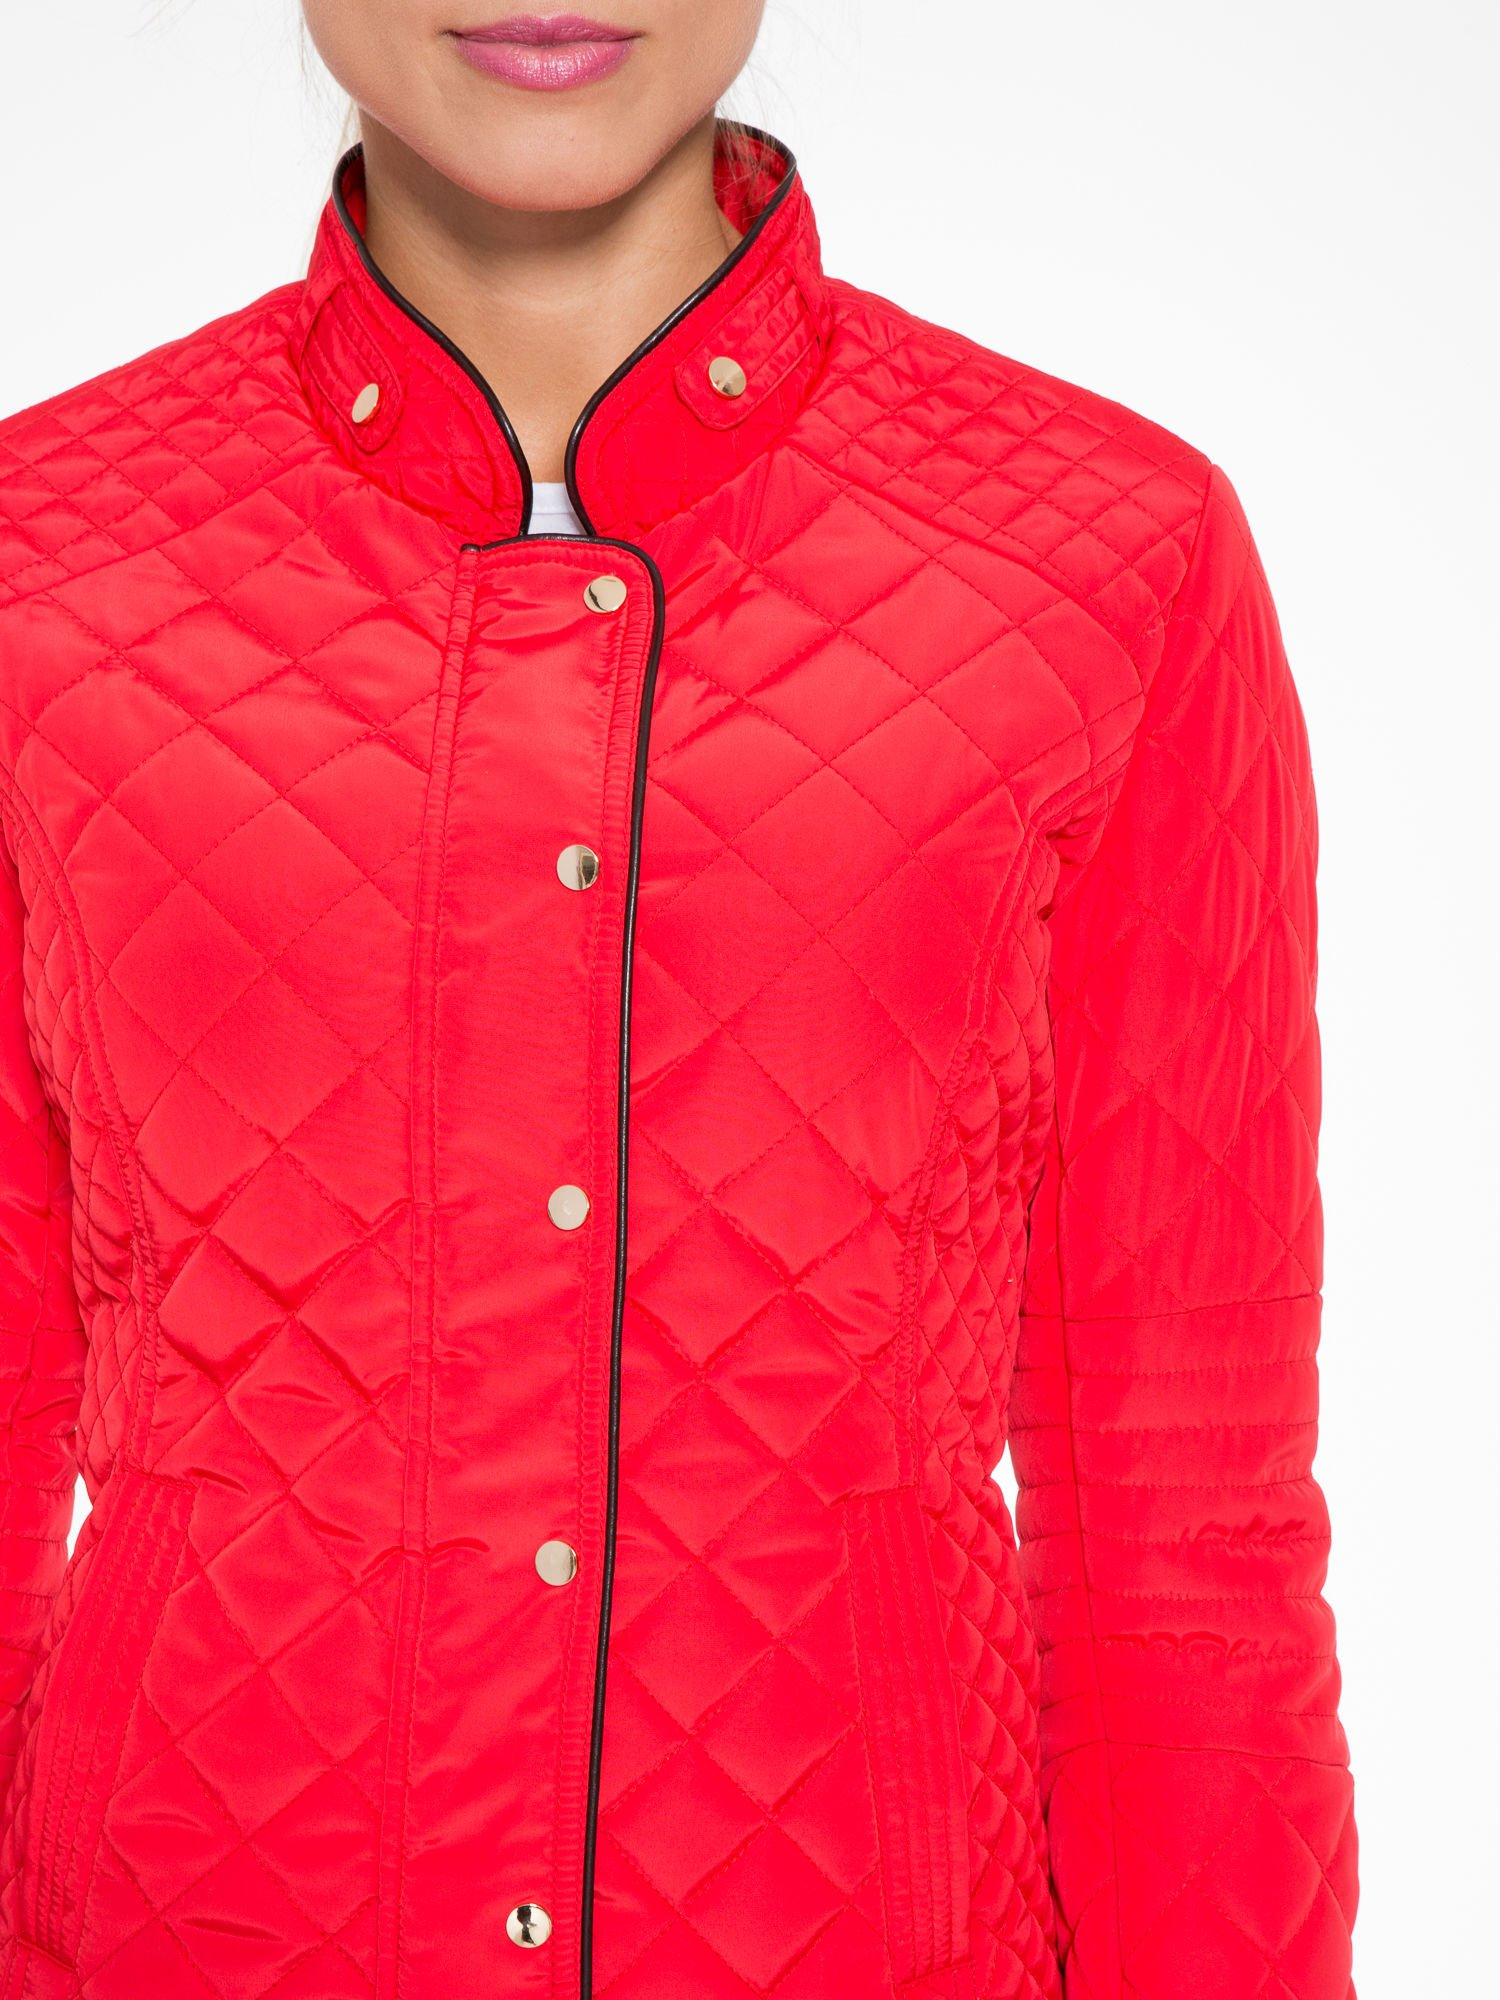 Czerwona pikowana kurtka ze skórzaną lamówką                                  zdj.                                  6